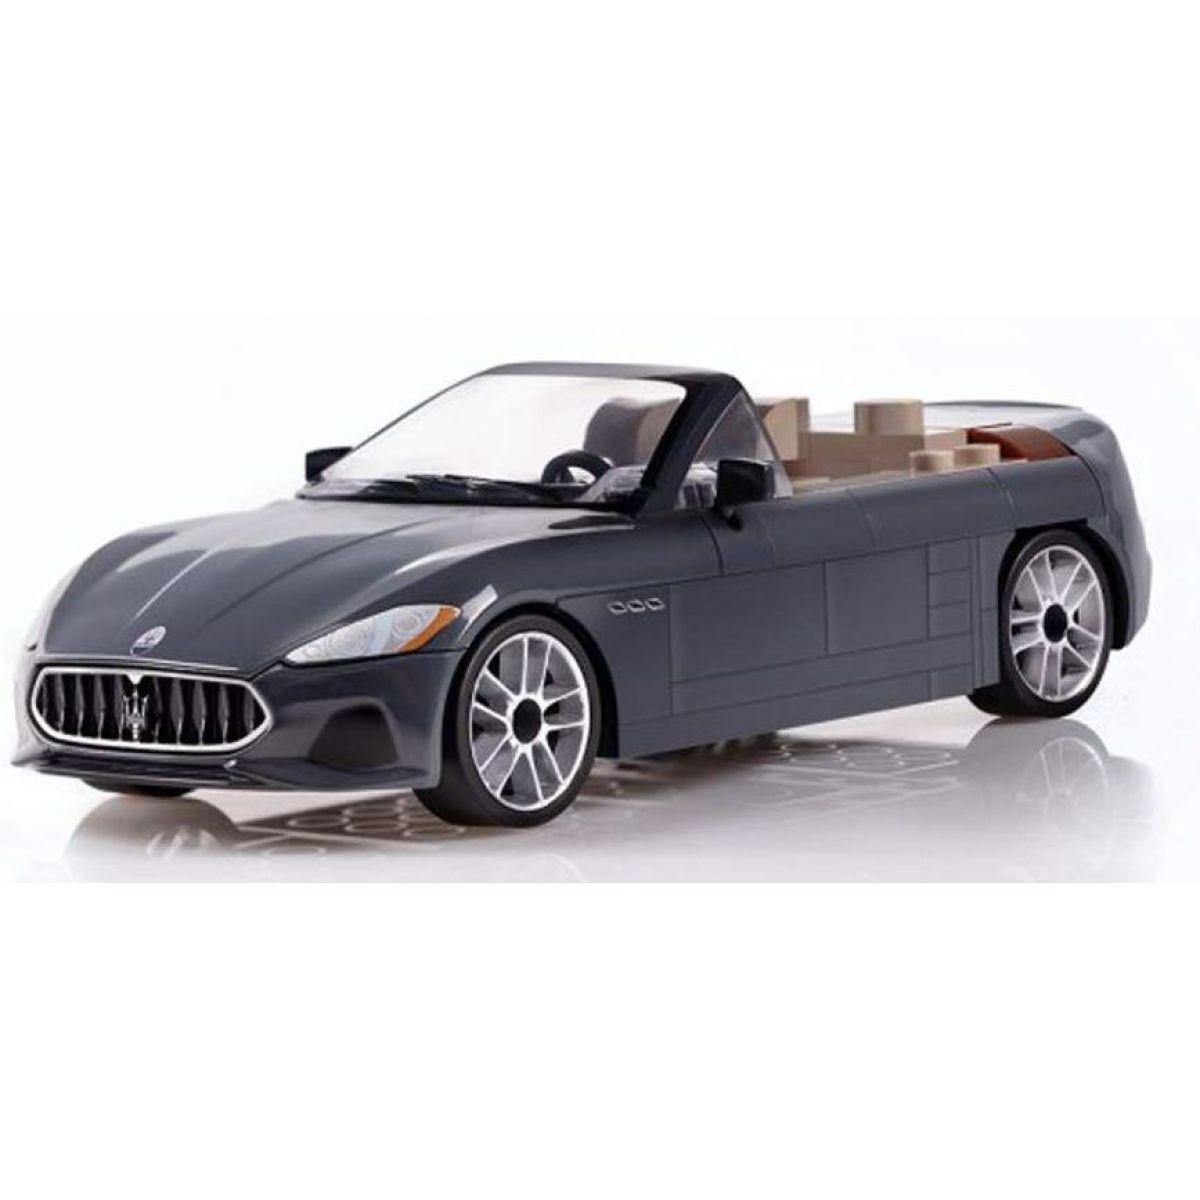 Cobi 24561 Maserati GranCabrio Sport 1:35